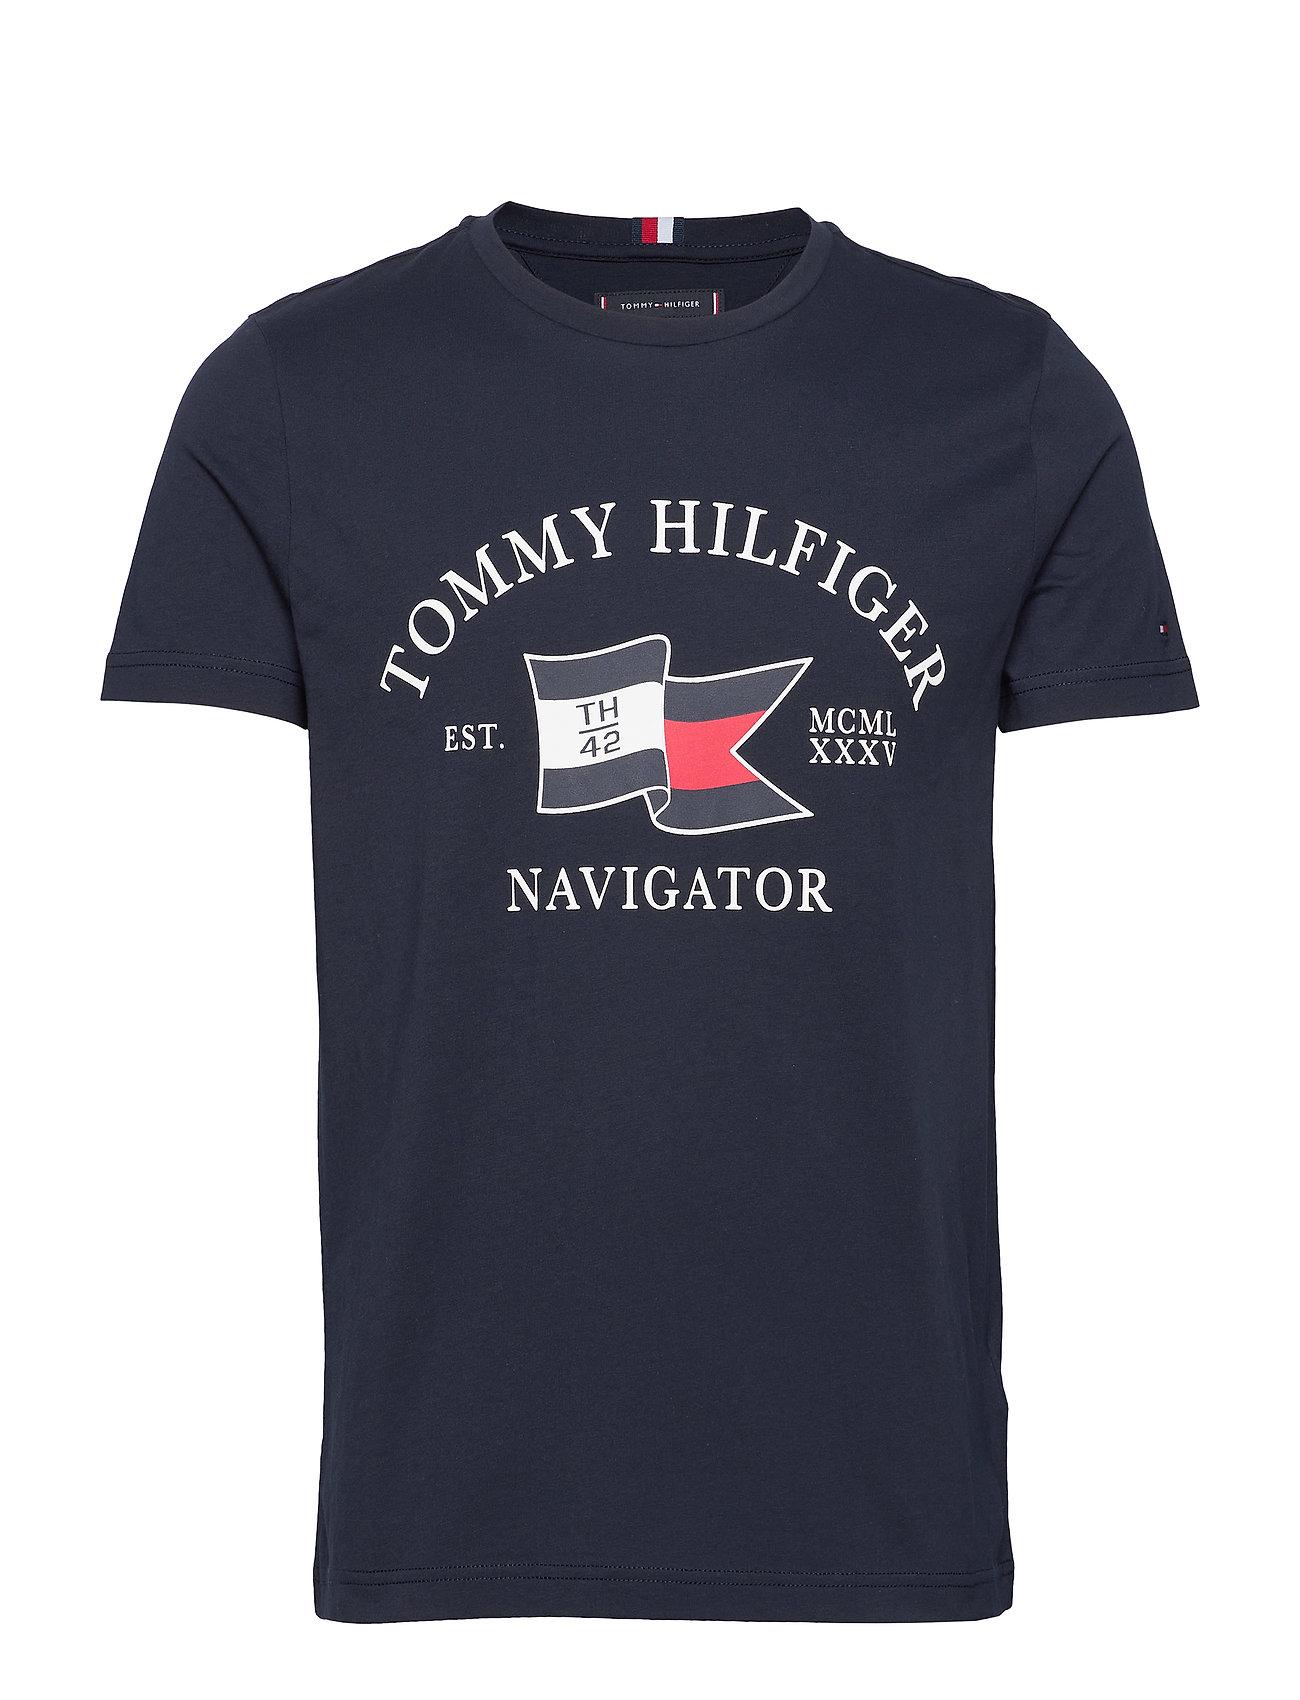 Tommy Hilfiger FOLDED FLAG TEE - DESERT SKY